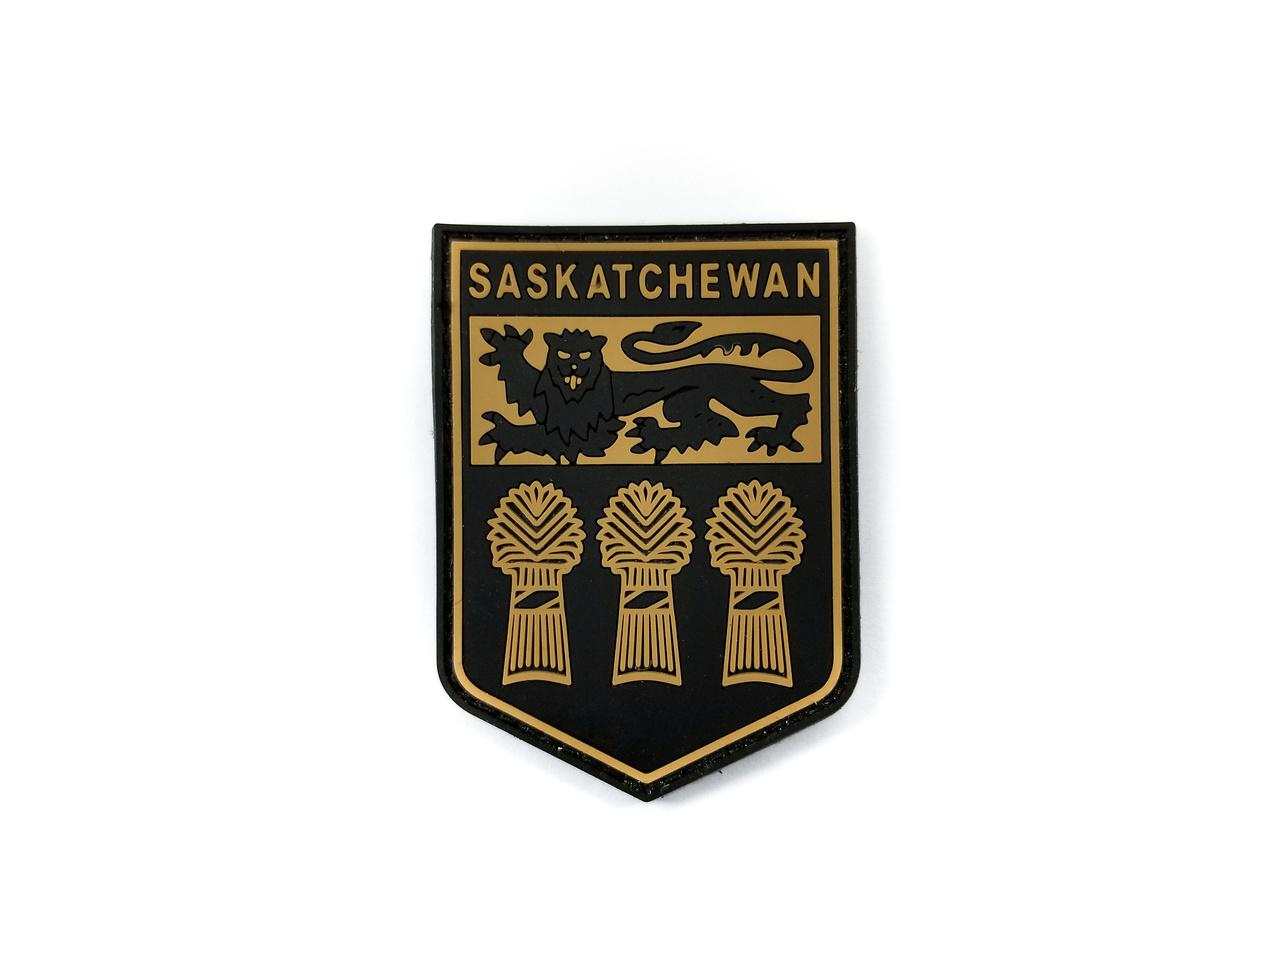 Tactical Innovations Canada PVC Patch - Saskatchewan - Black/Tan